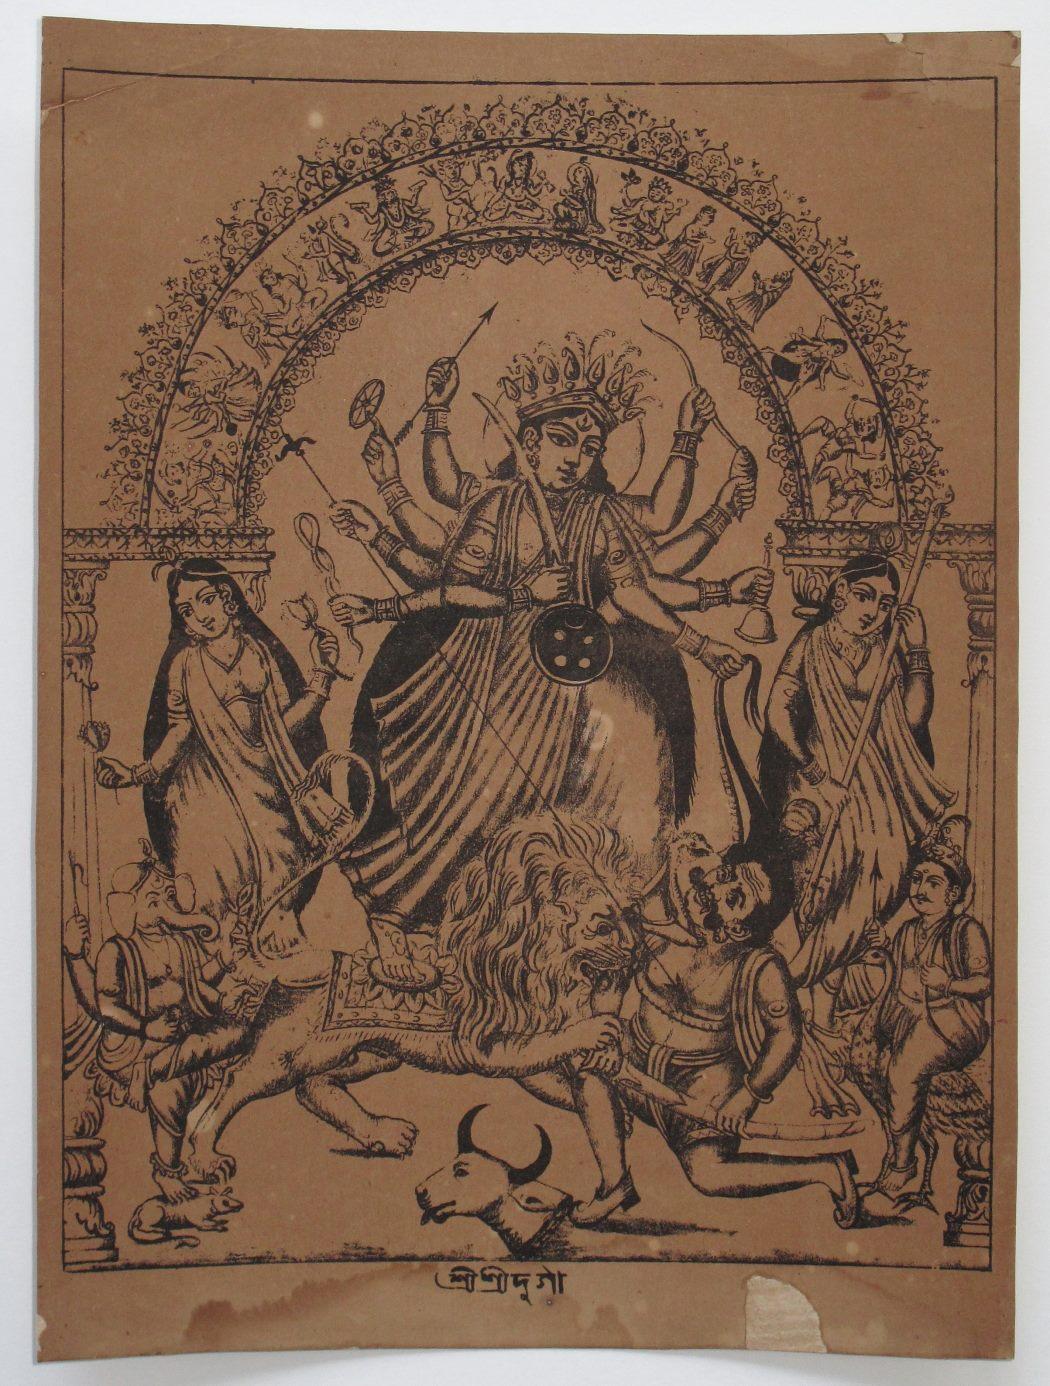 Goddess Durga - Vintage Print c1870-80's